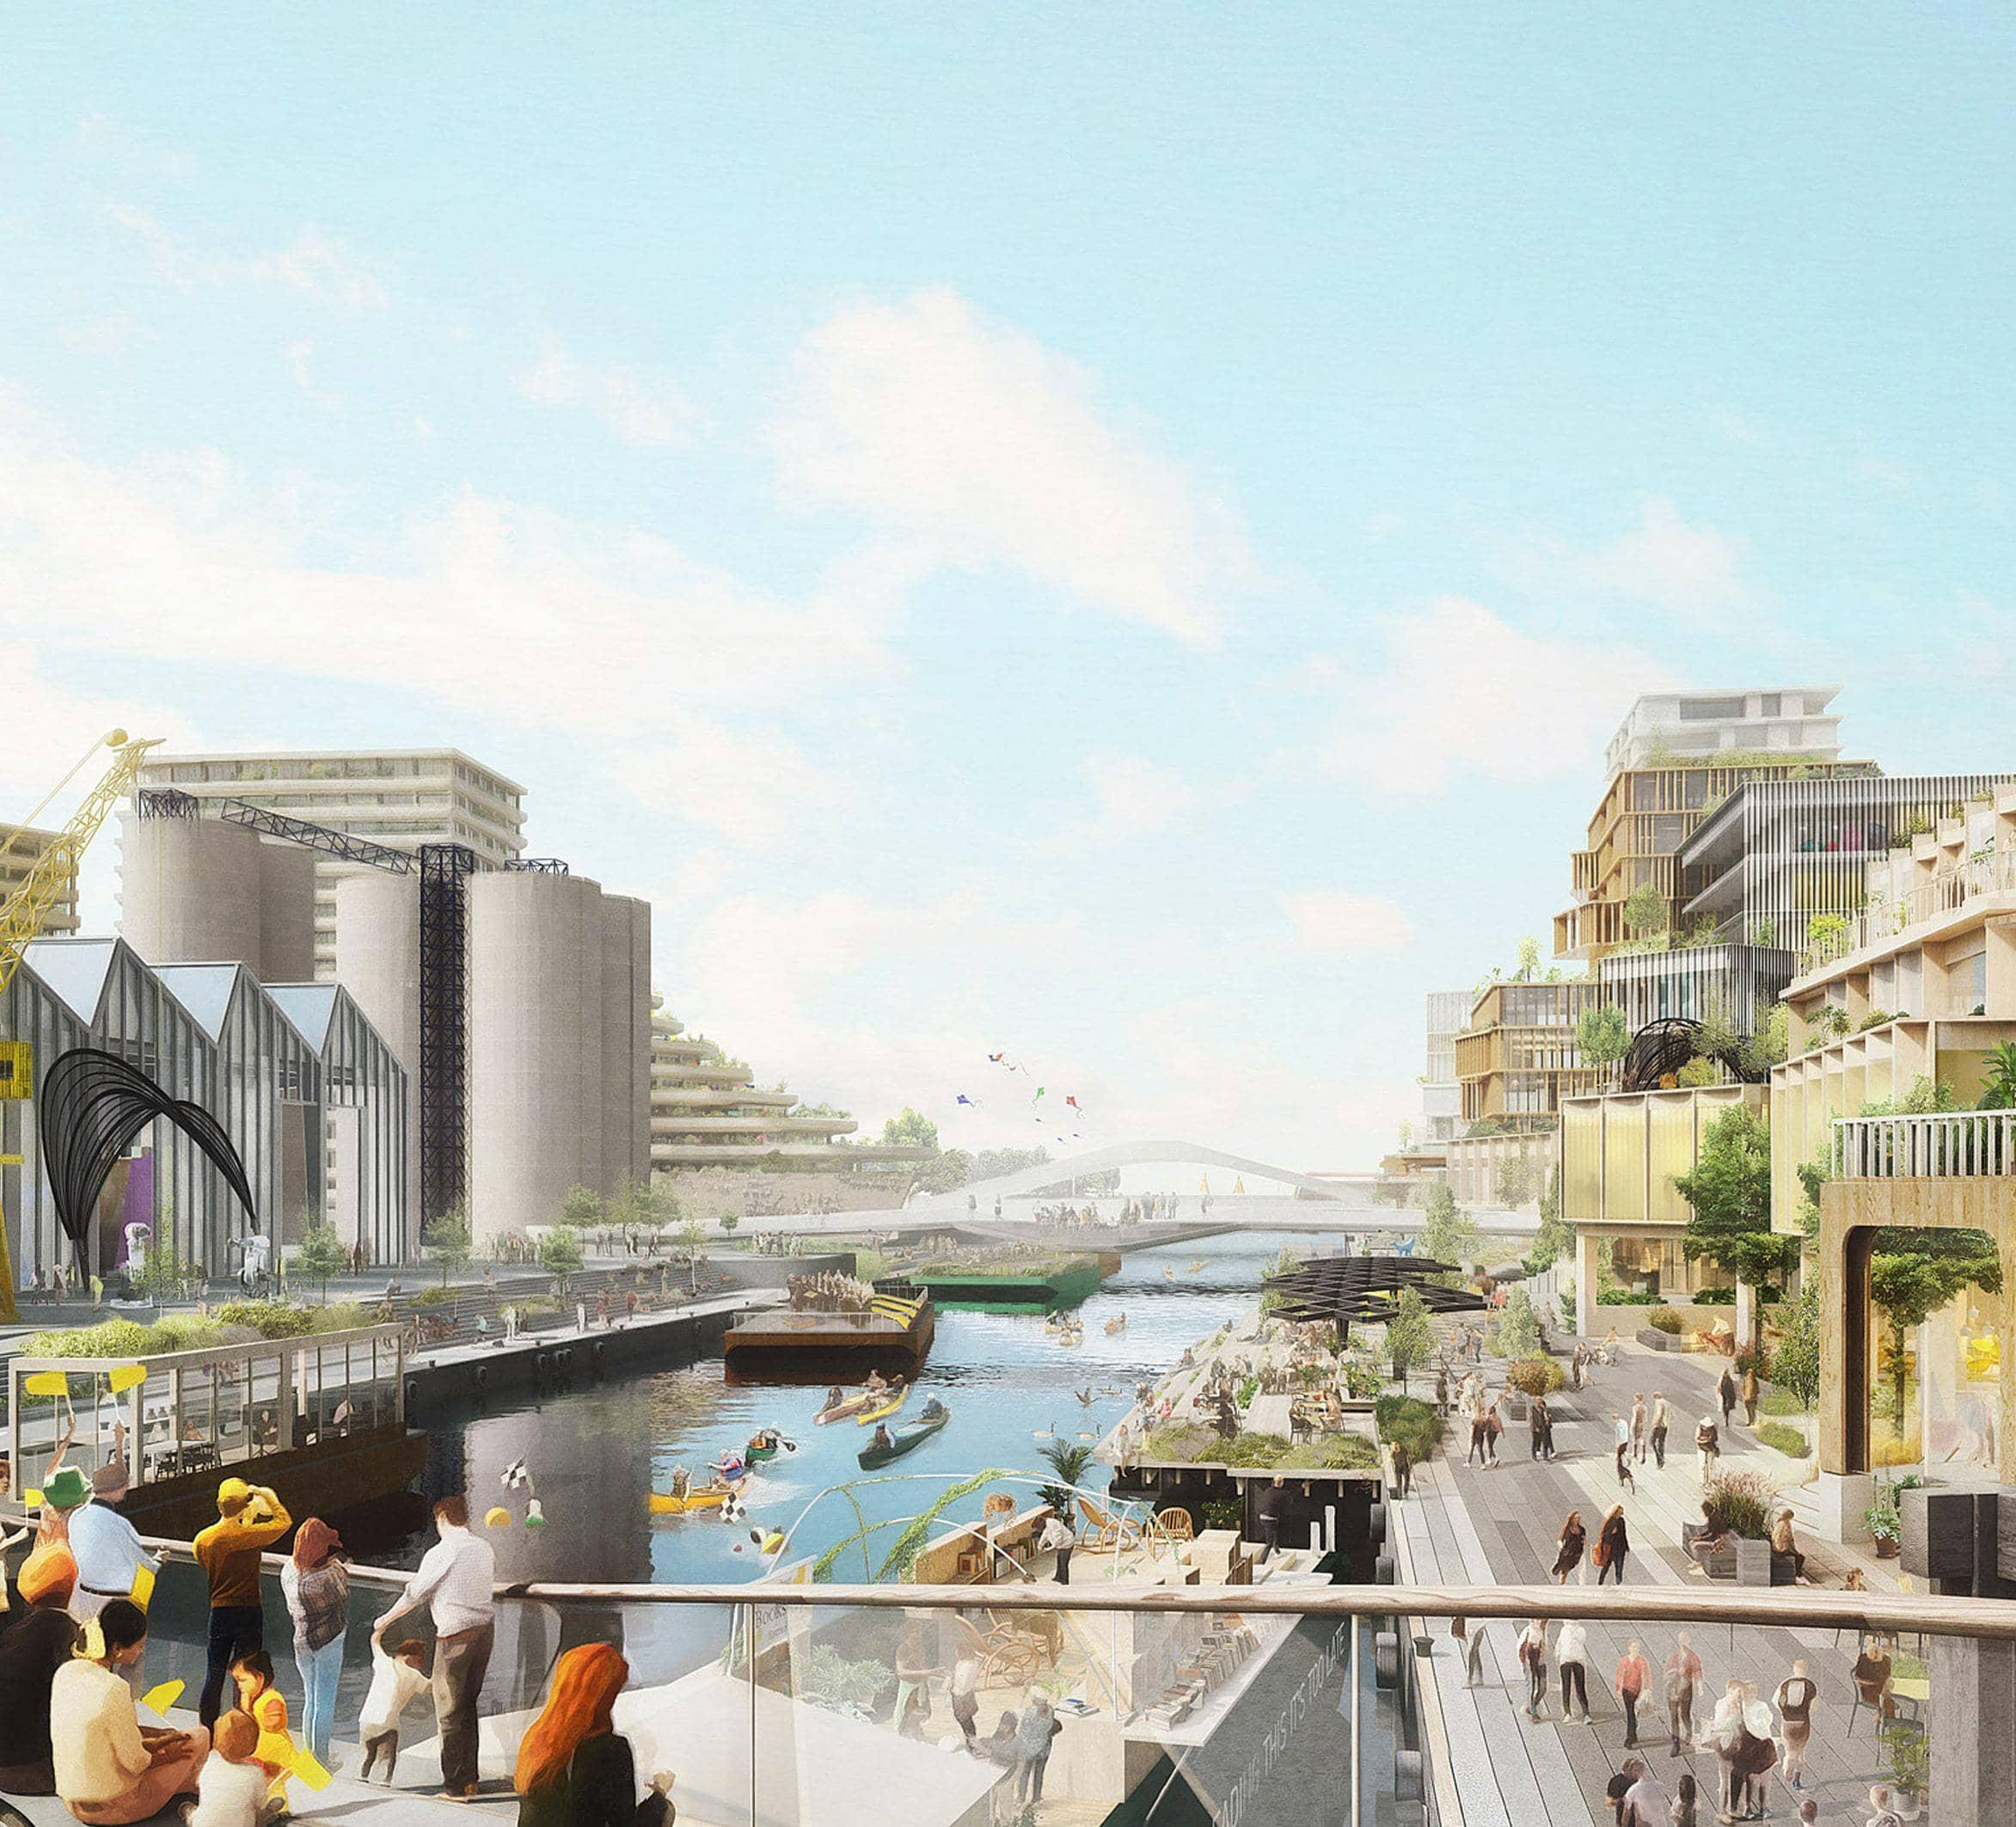 GOOGLE AFFILIATE SCRAPS PLAN FOR TORONTO SMART CITY PROJECT